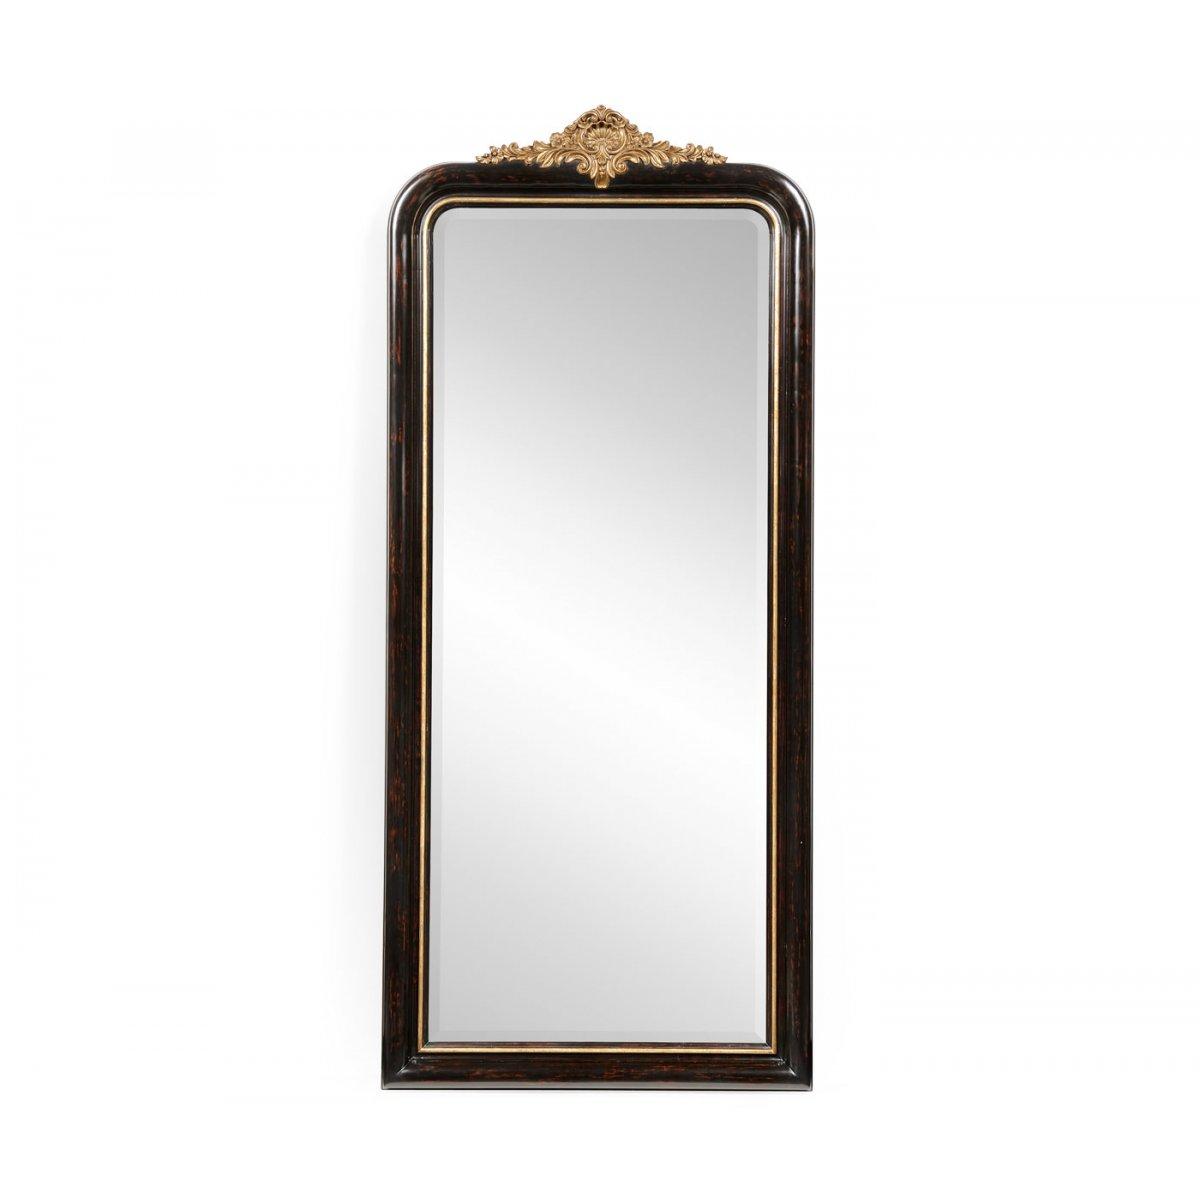 Full length black mirror gilded french style swanky for Black full length wall mirror